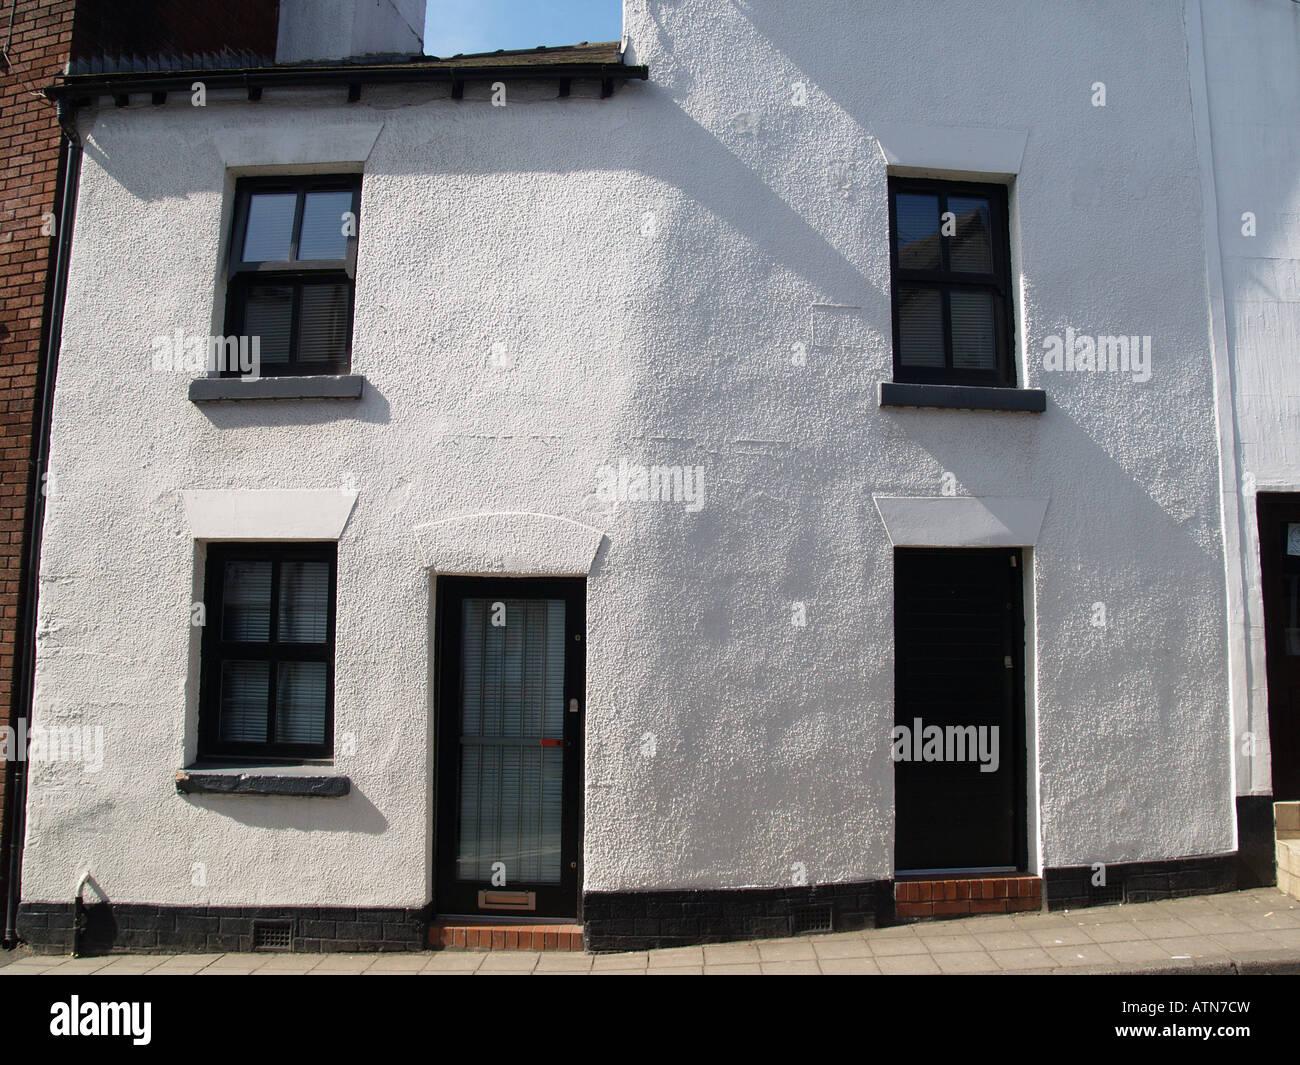 Curved bent white house black windows doors